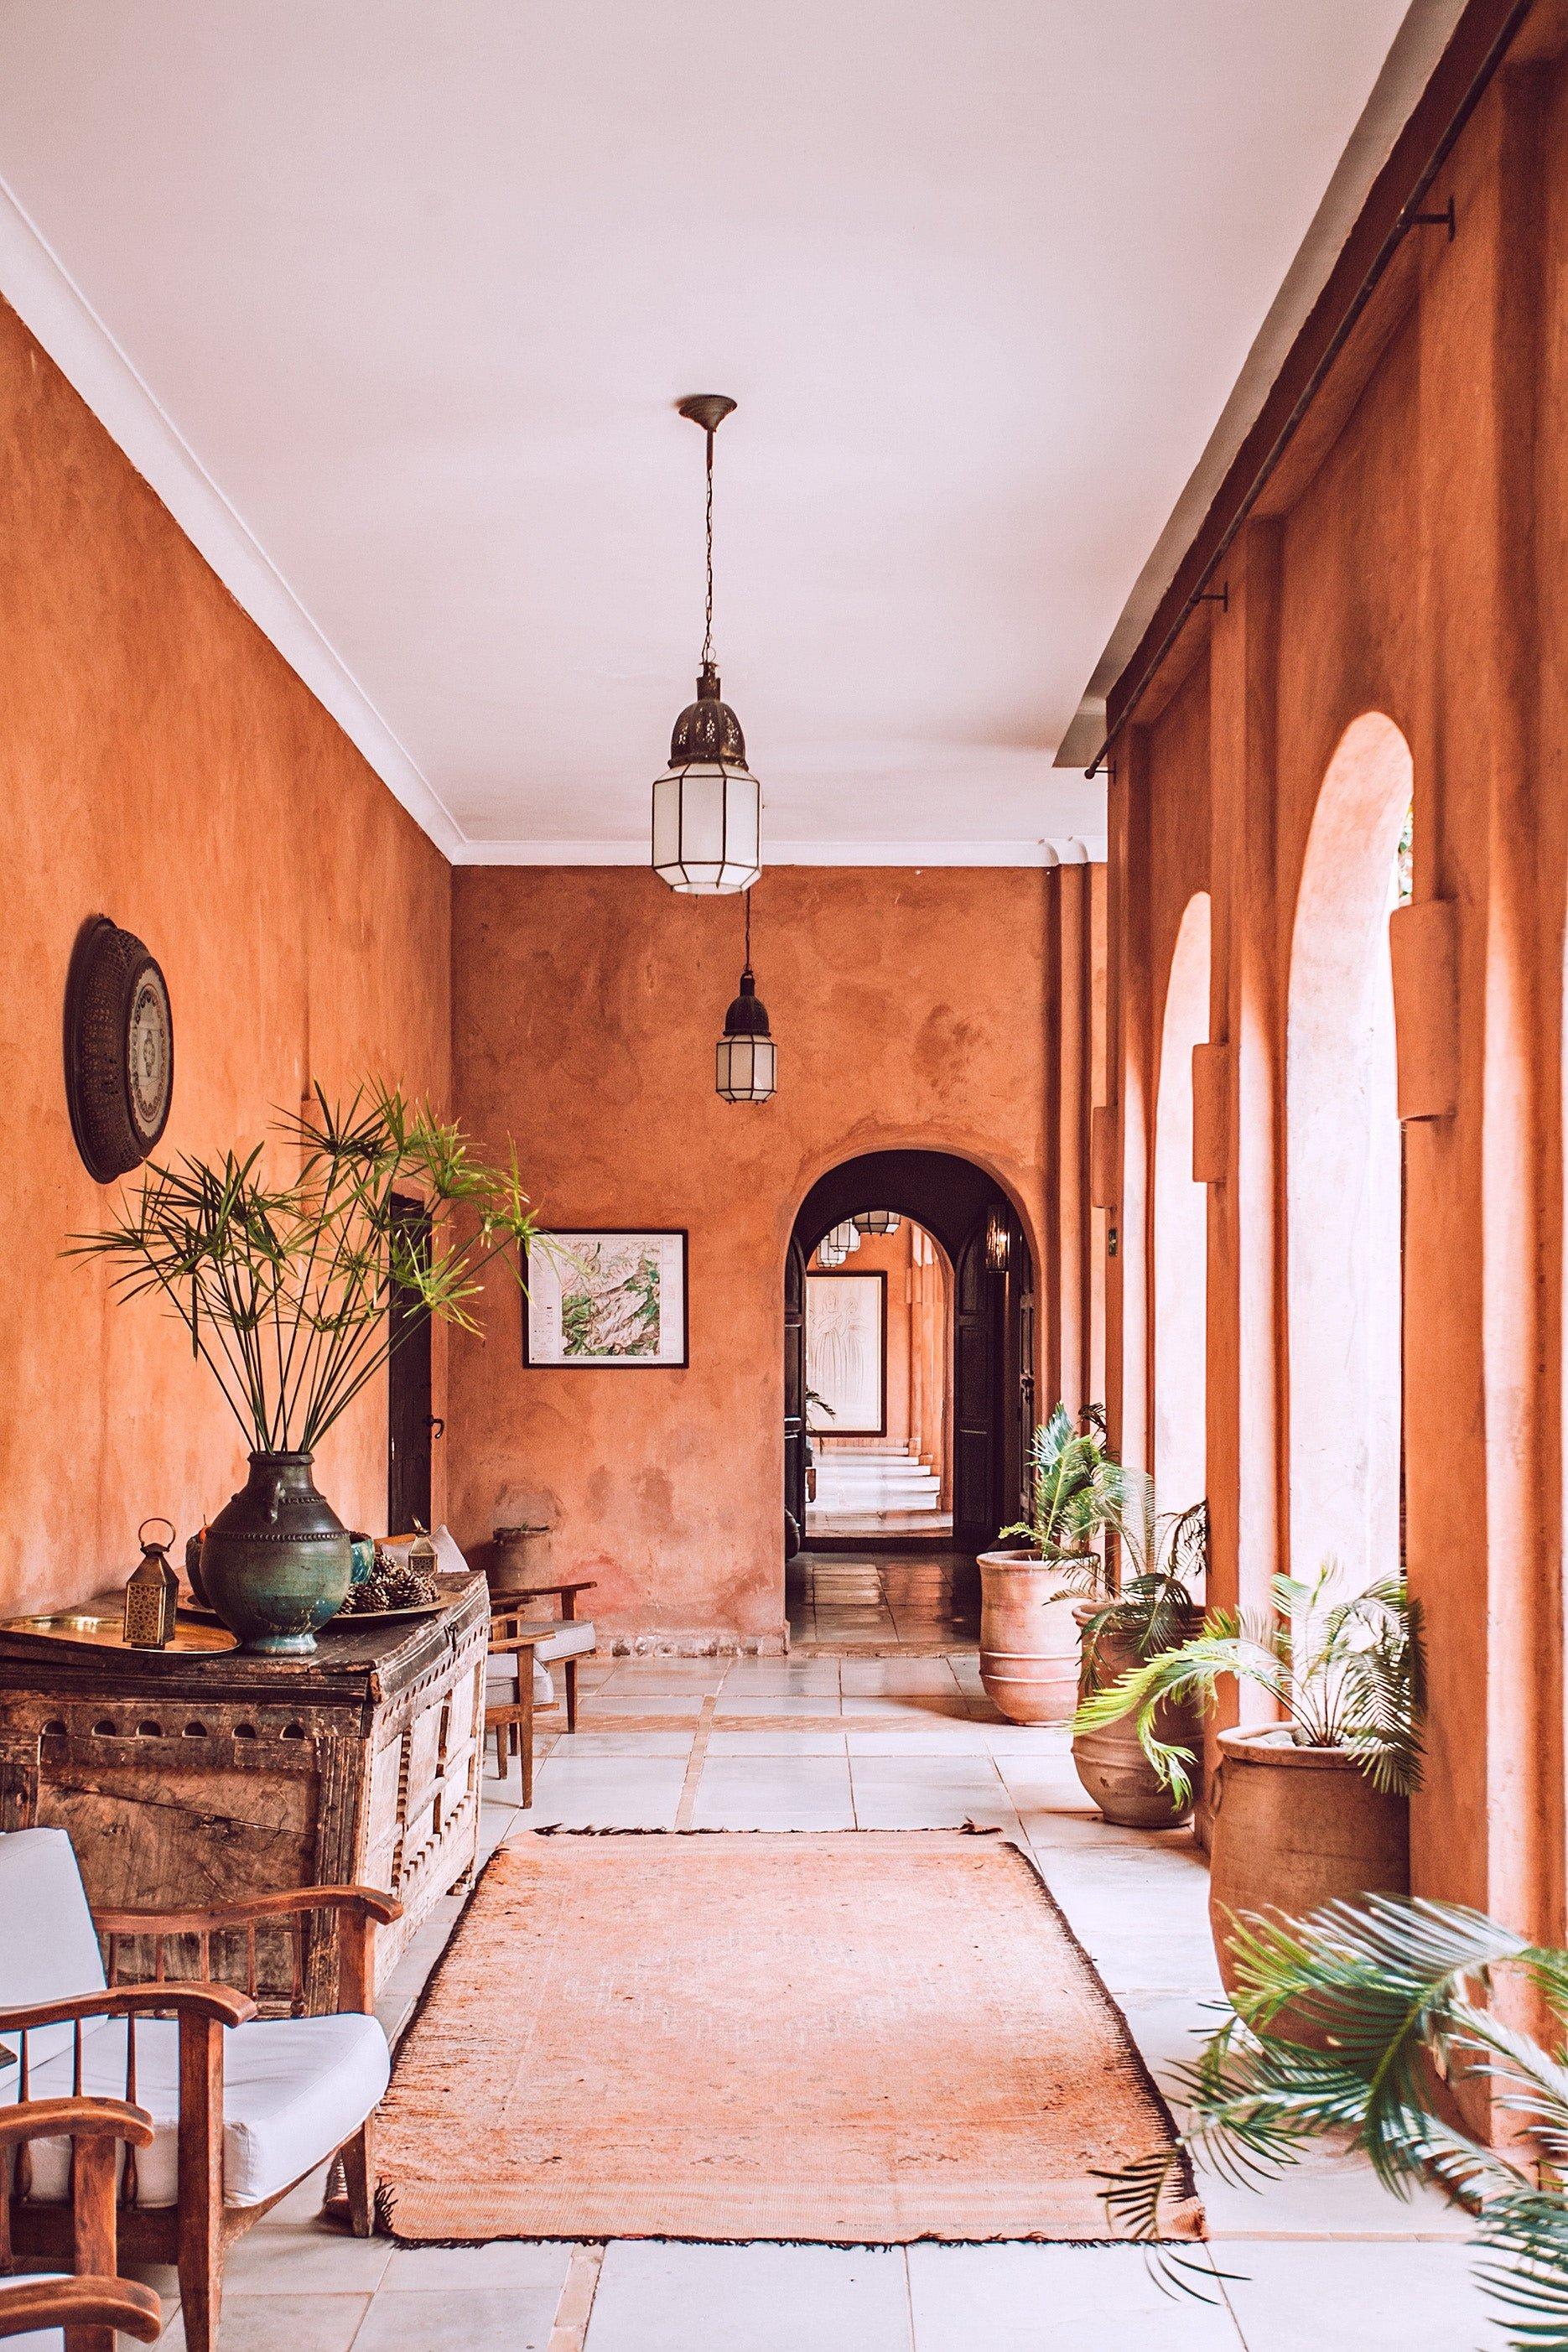 Spanish Style Home Decor Interior Unique Spanish Style Homes How to Embrace Iberian Interior Design